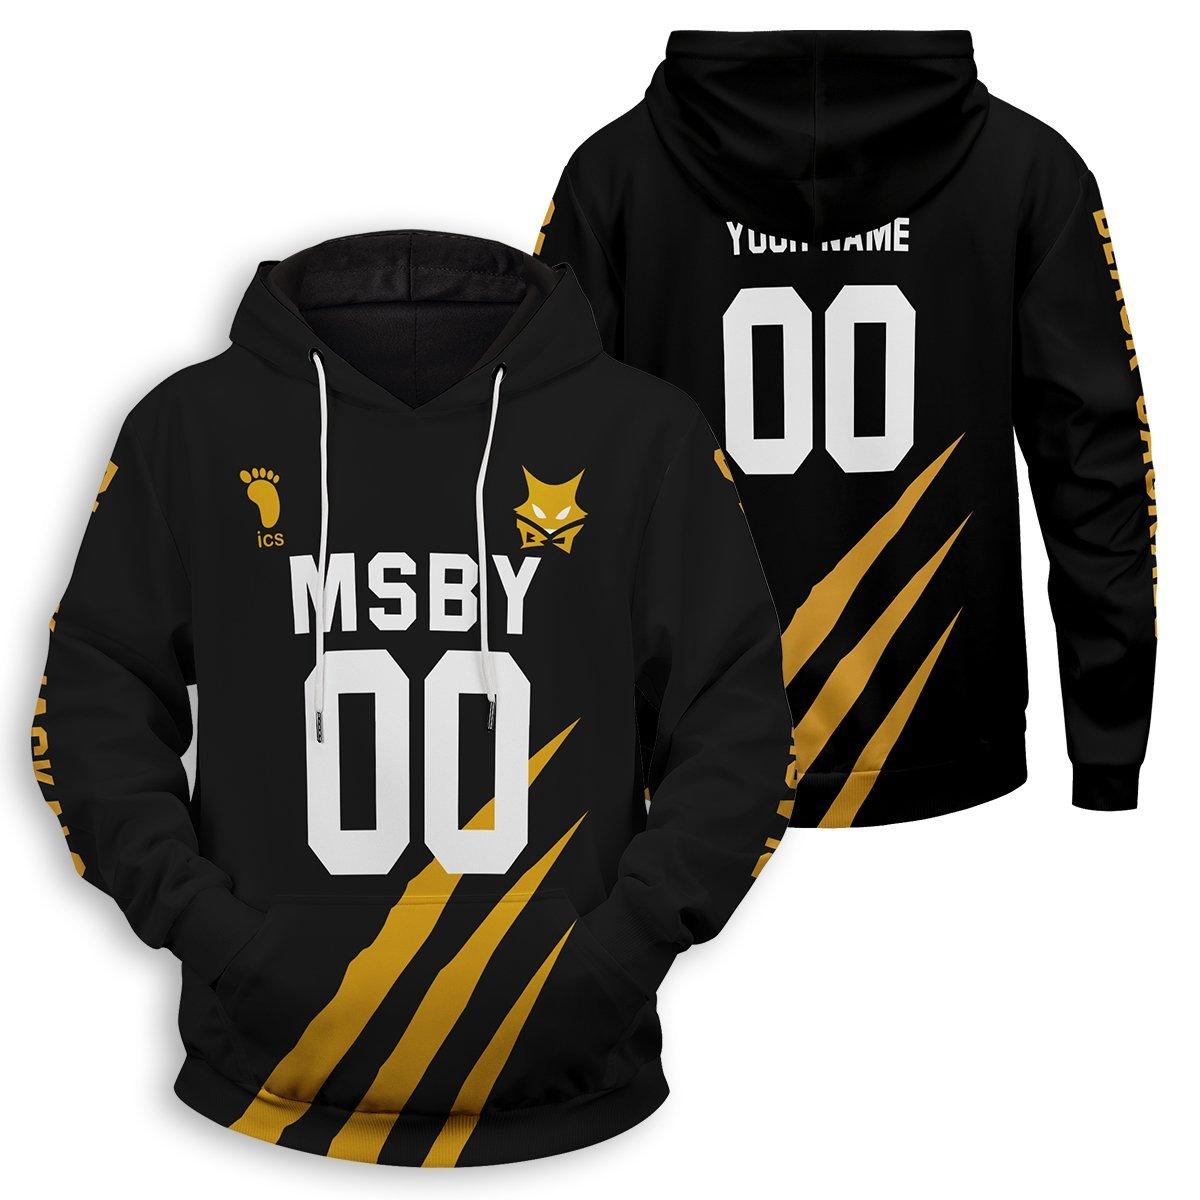 Personalized MSBY Black Jackals Unisex Pullover Hoodie FDM3009 S Official Otaku Treat Merch